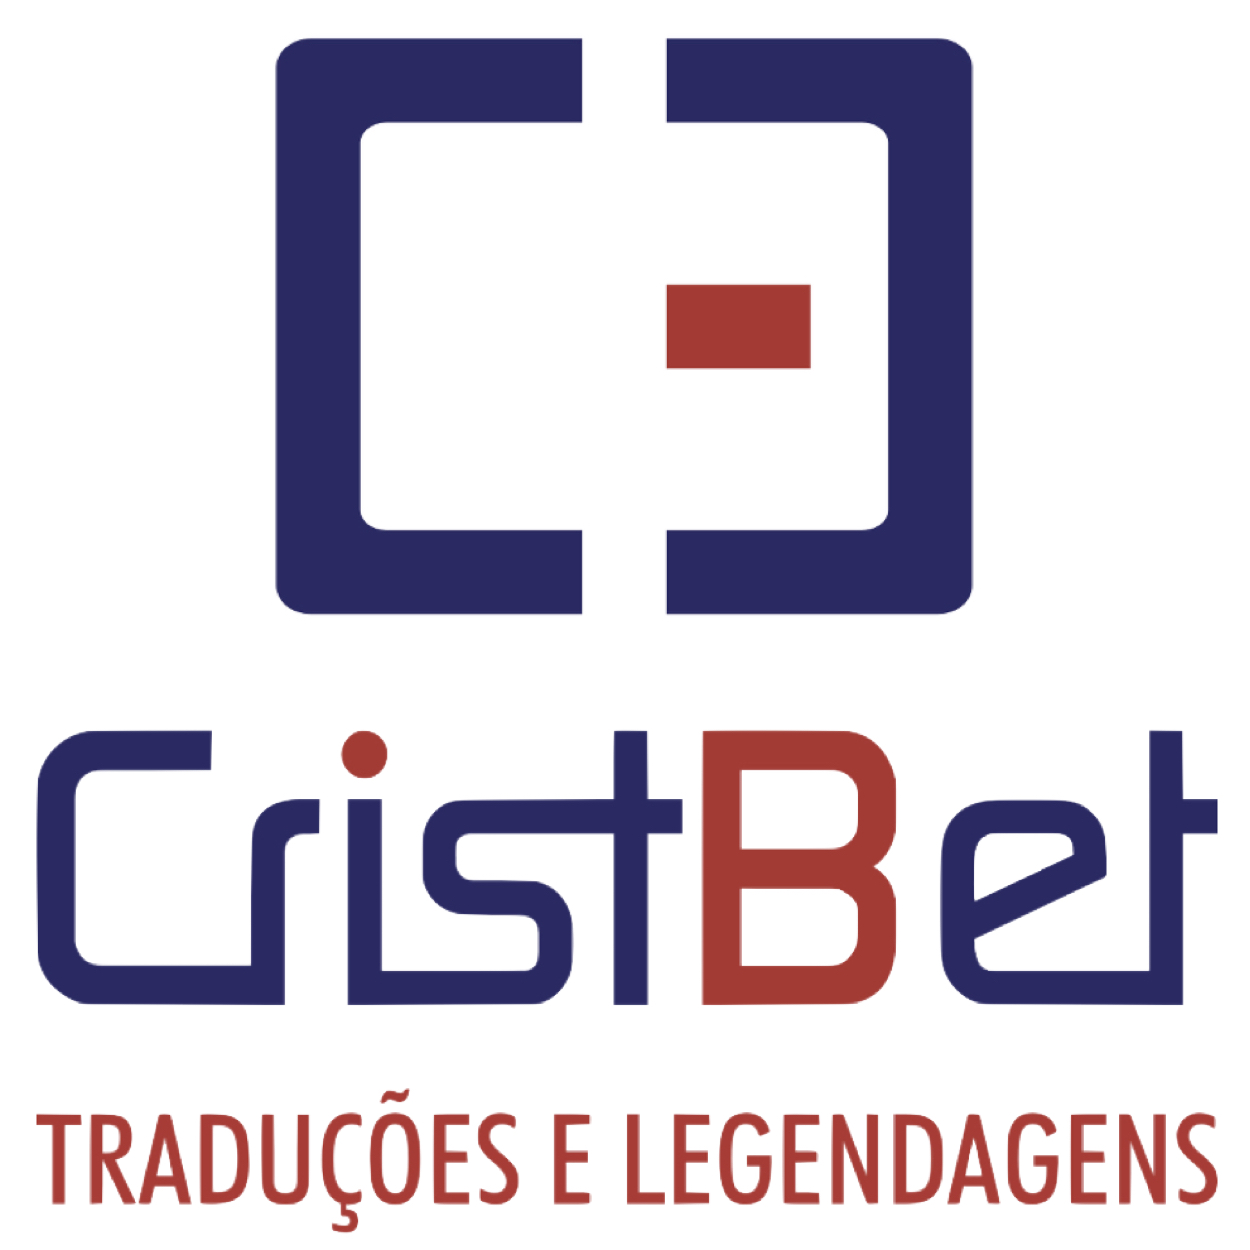 Cristina Cid de Bettencourt